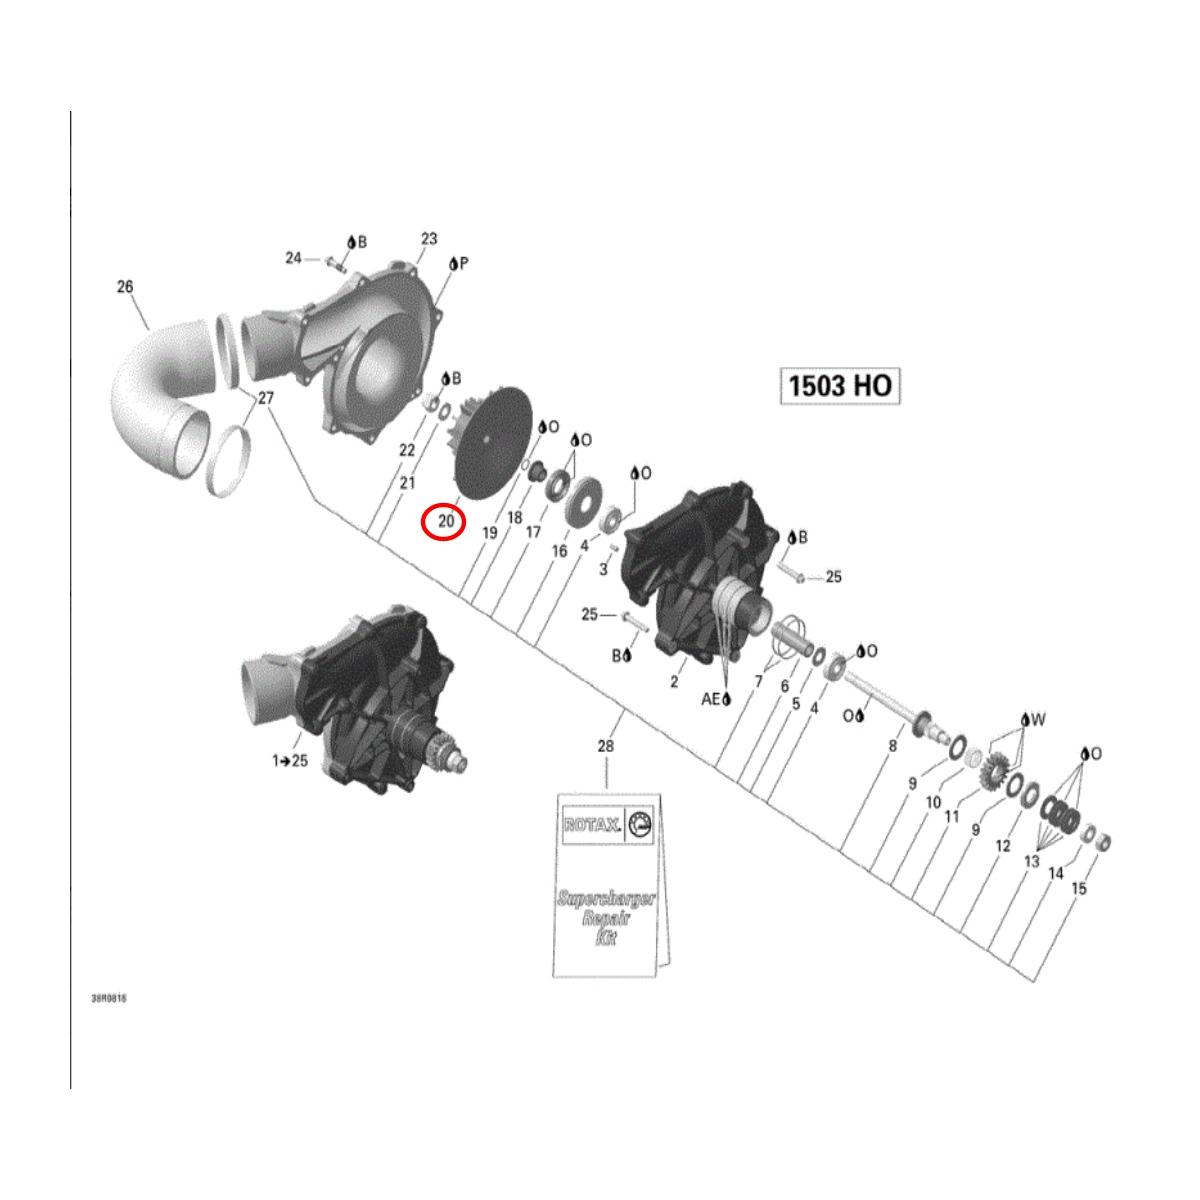 Hélice Supercharged Sea Doo 4 TEC*  - Radical Peças - Peças para Jet Ski